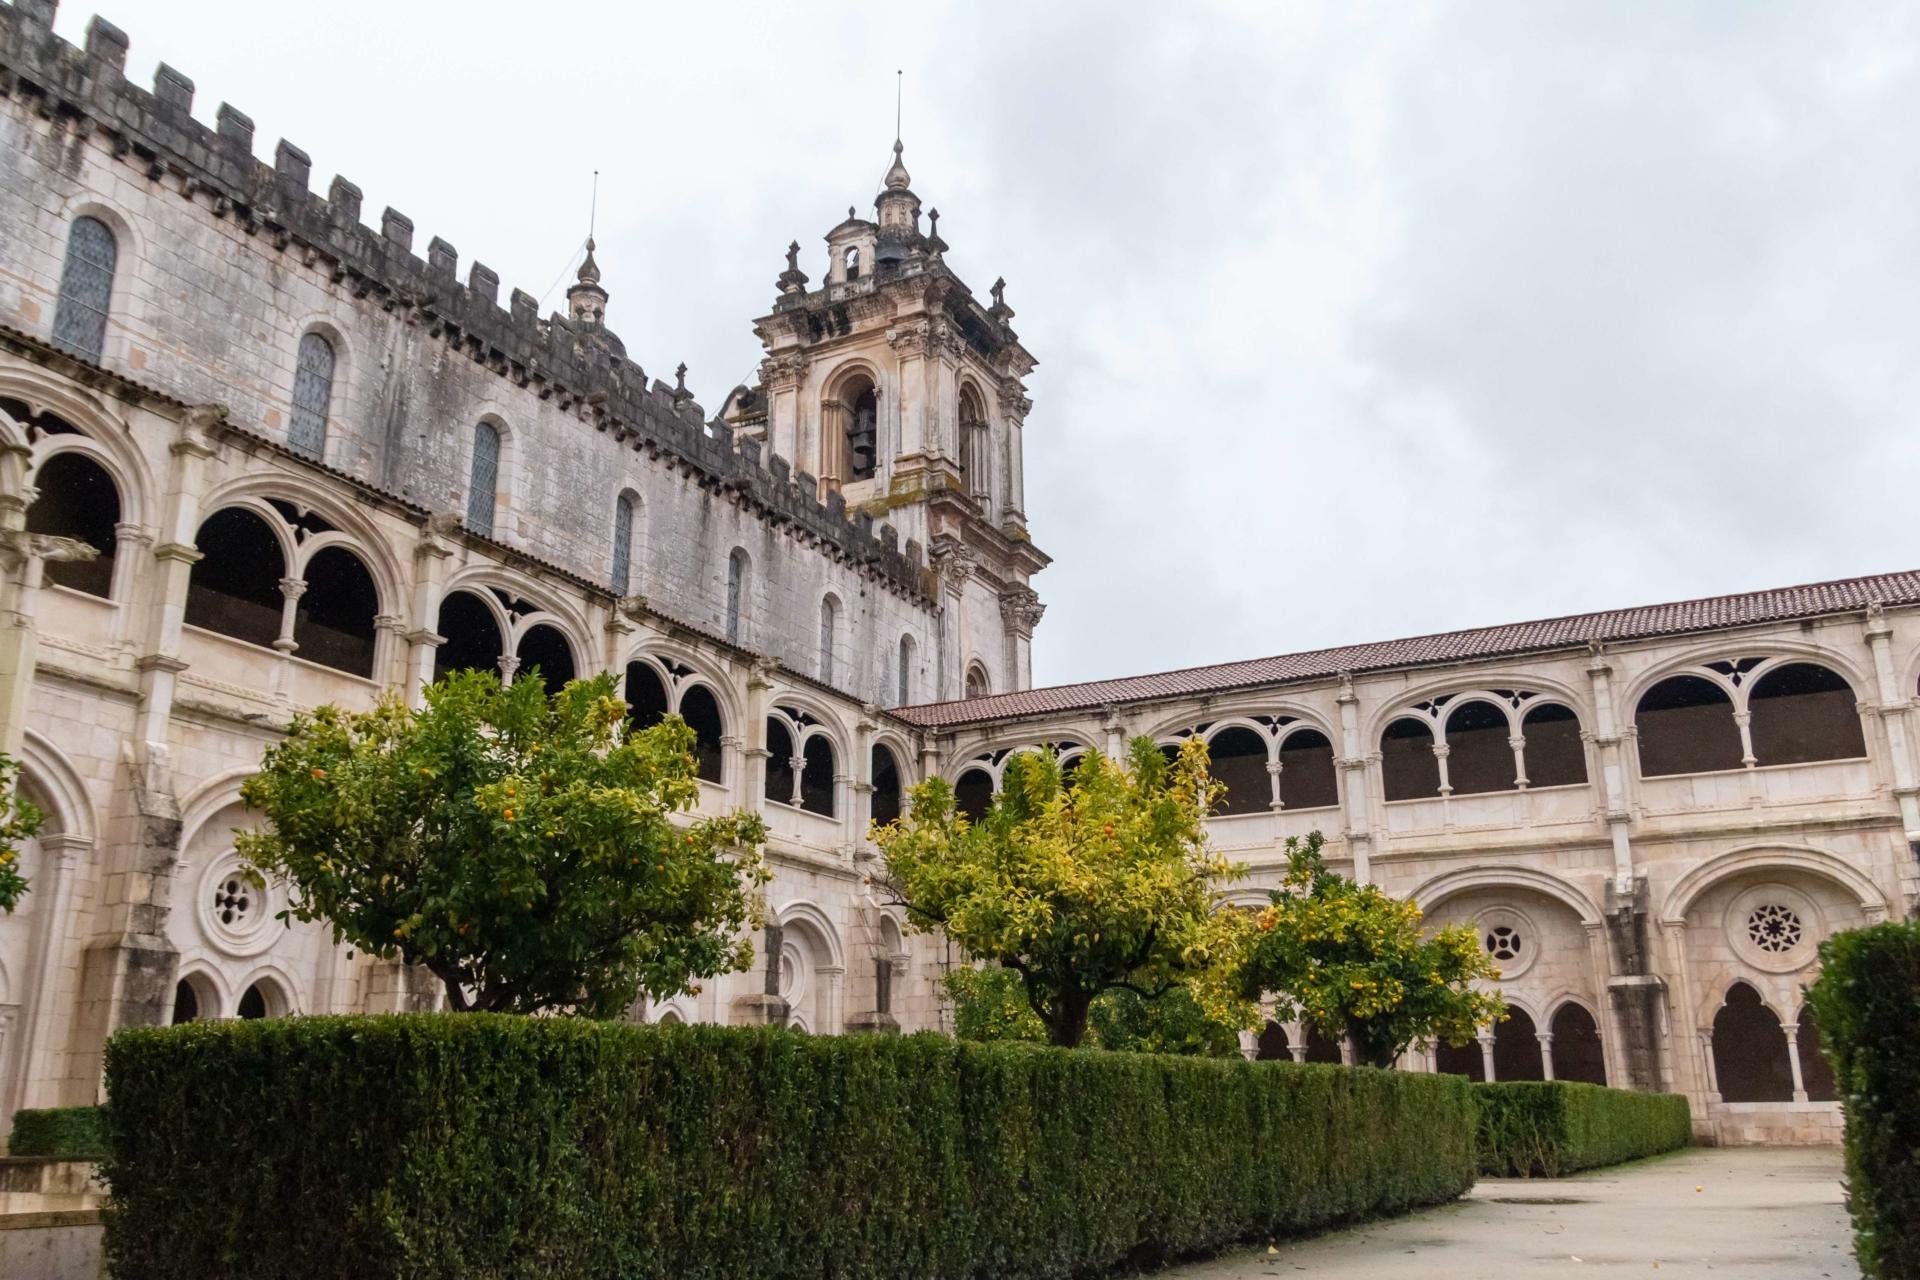 Monastère d'Alcobaça, Portugal